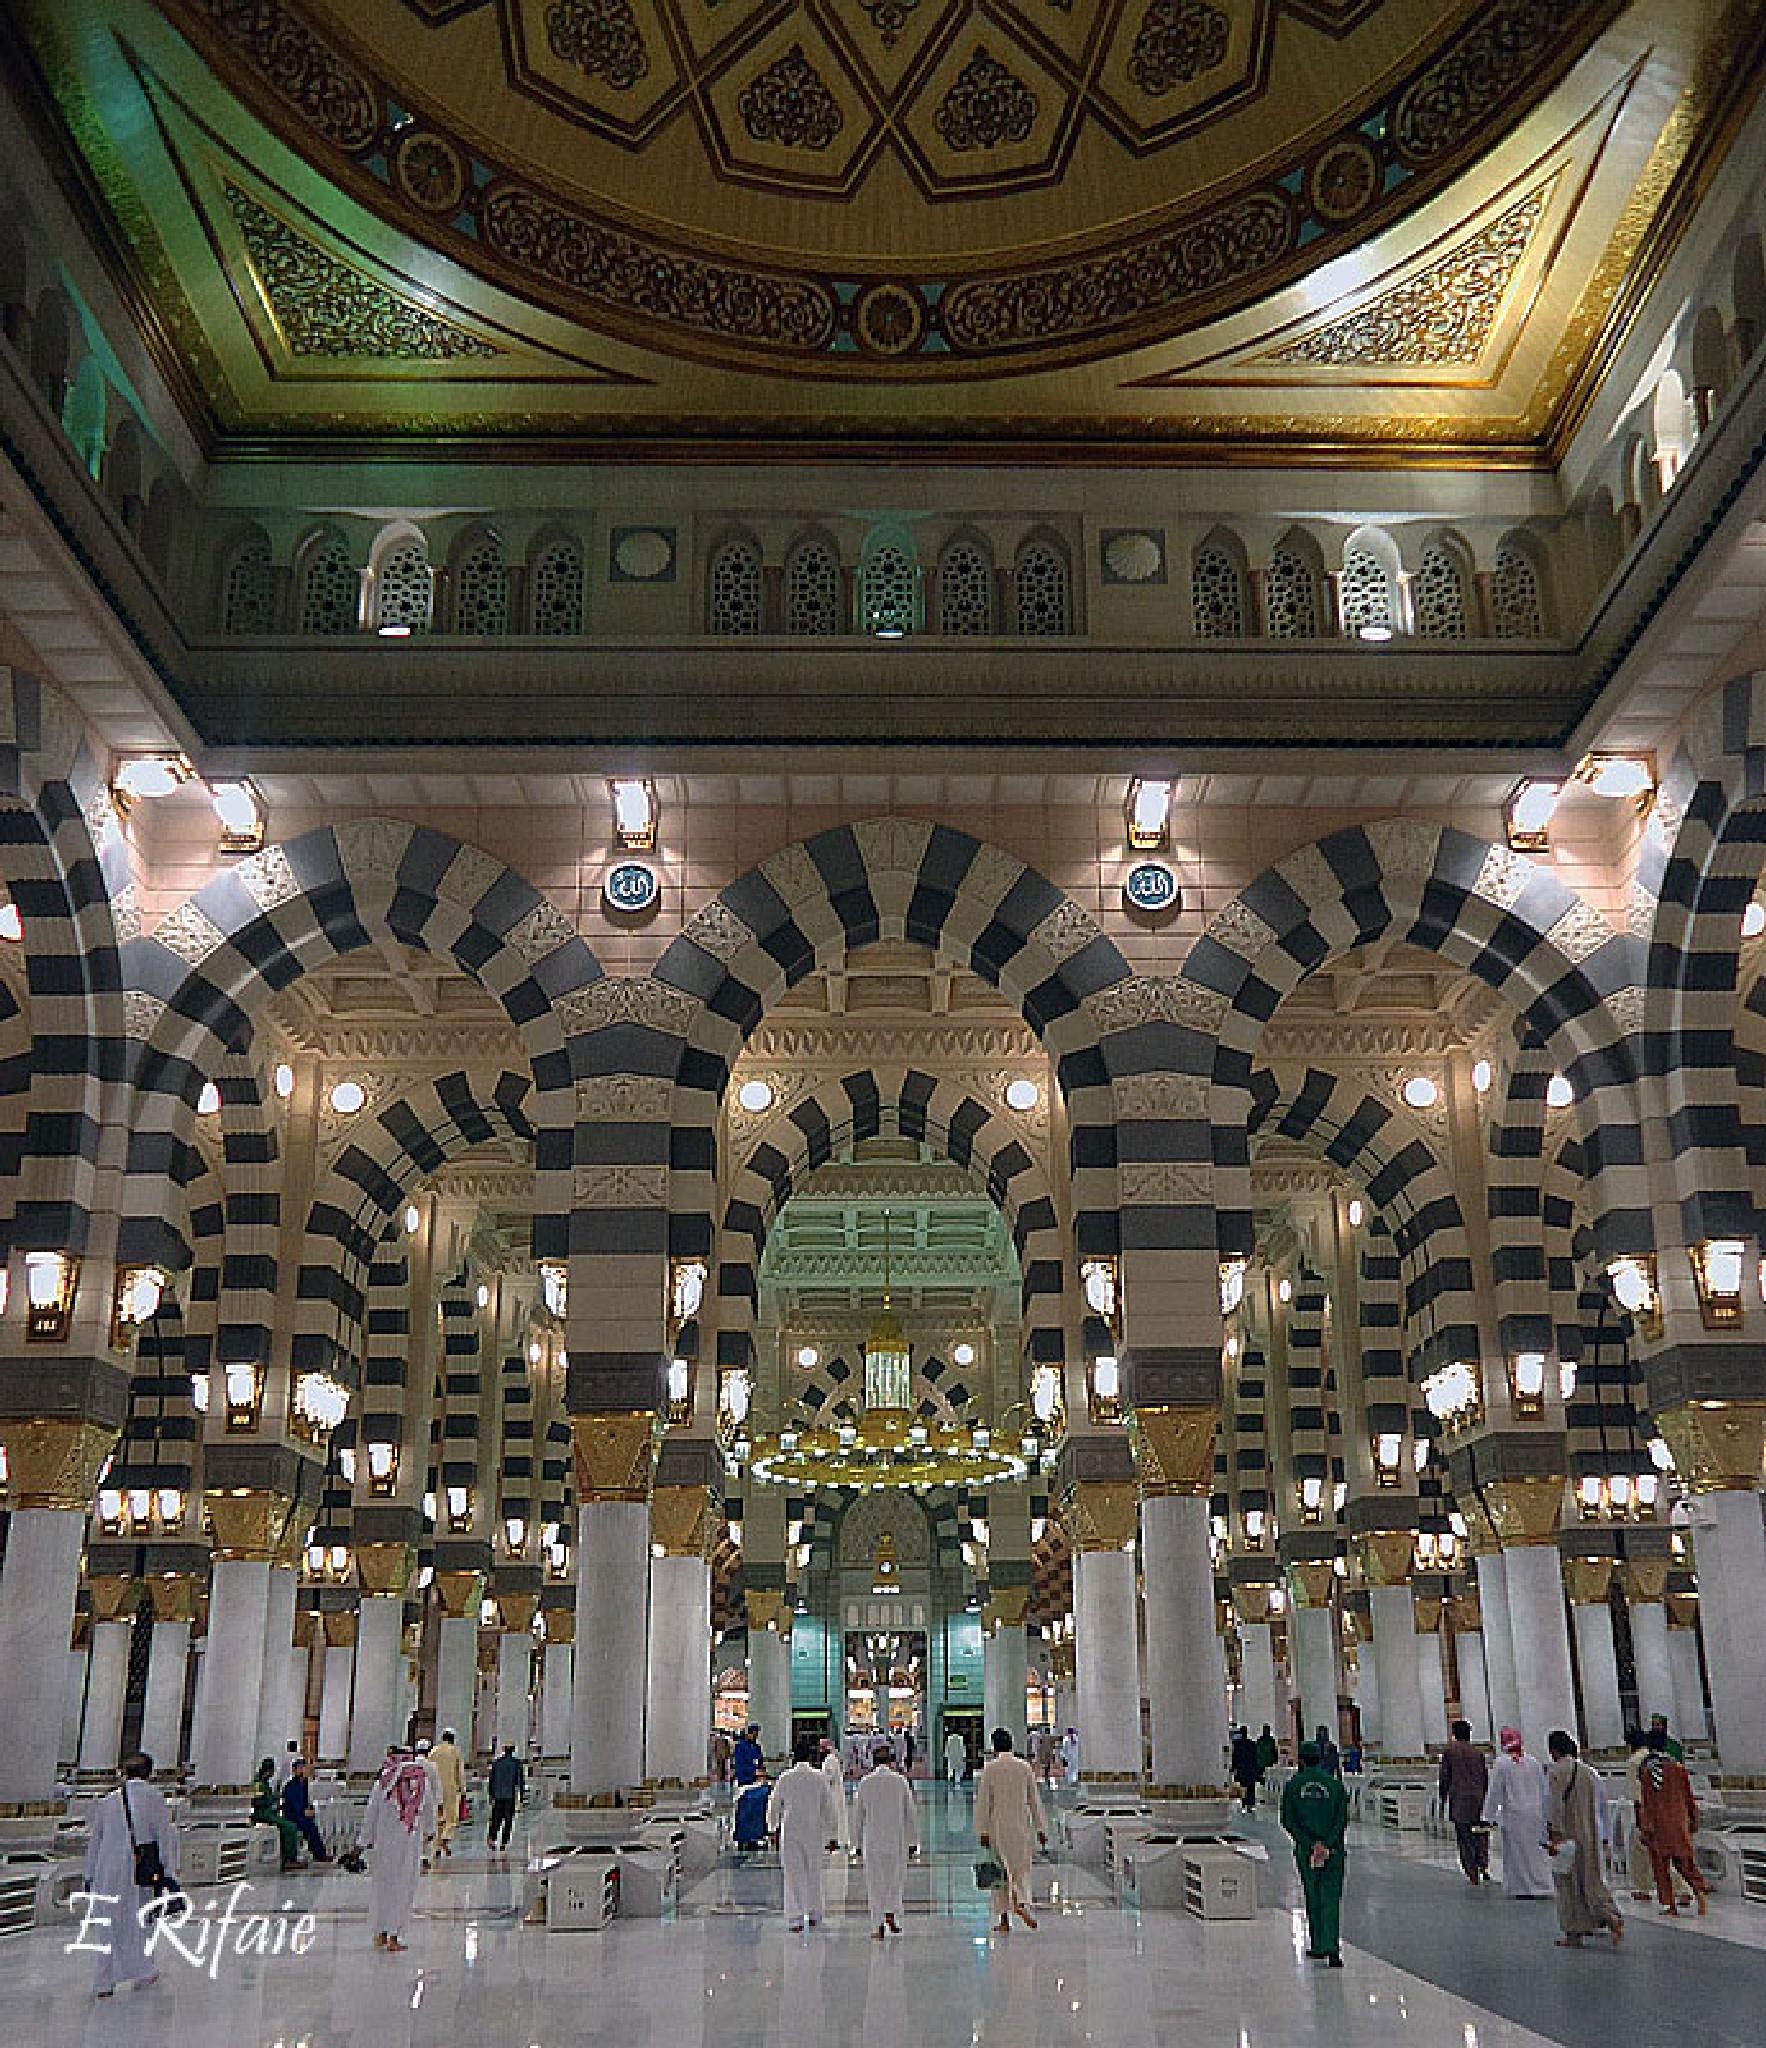 Al Madinah mosque by Emad Eldin Moustafa El Refaie